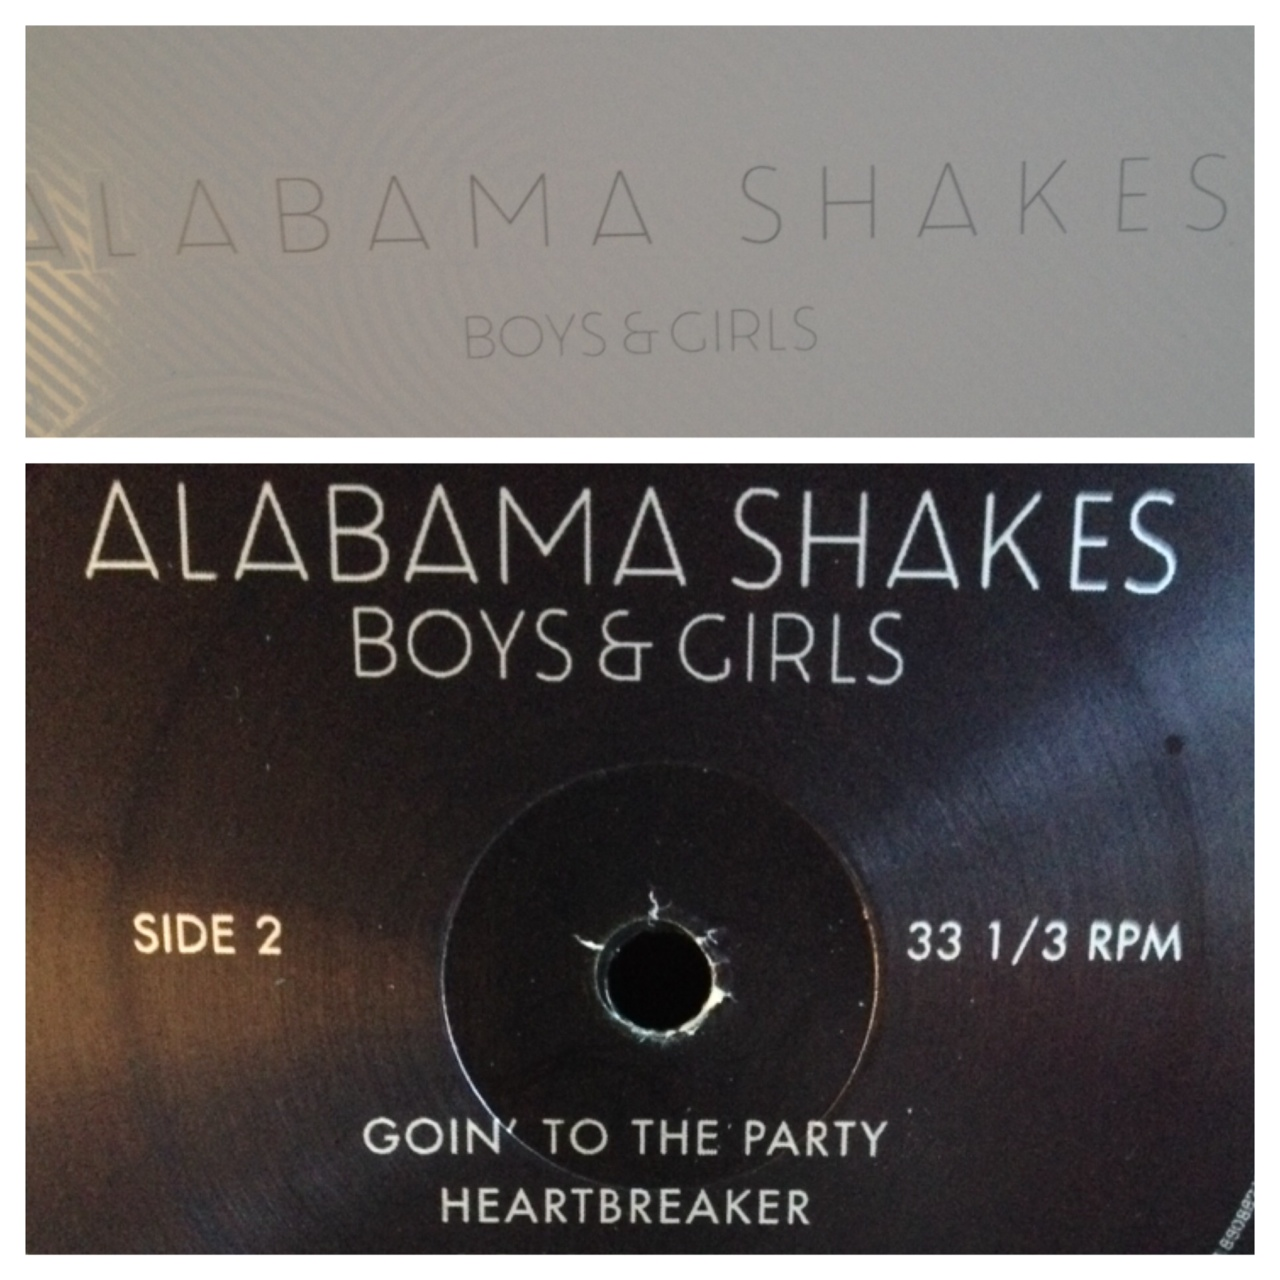 Alabama Shakes - Boys and Girls on Vinyl